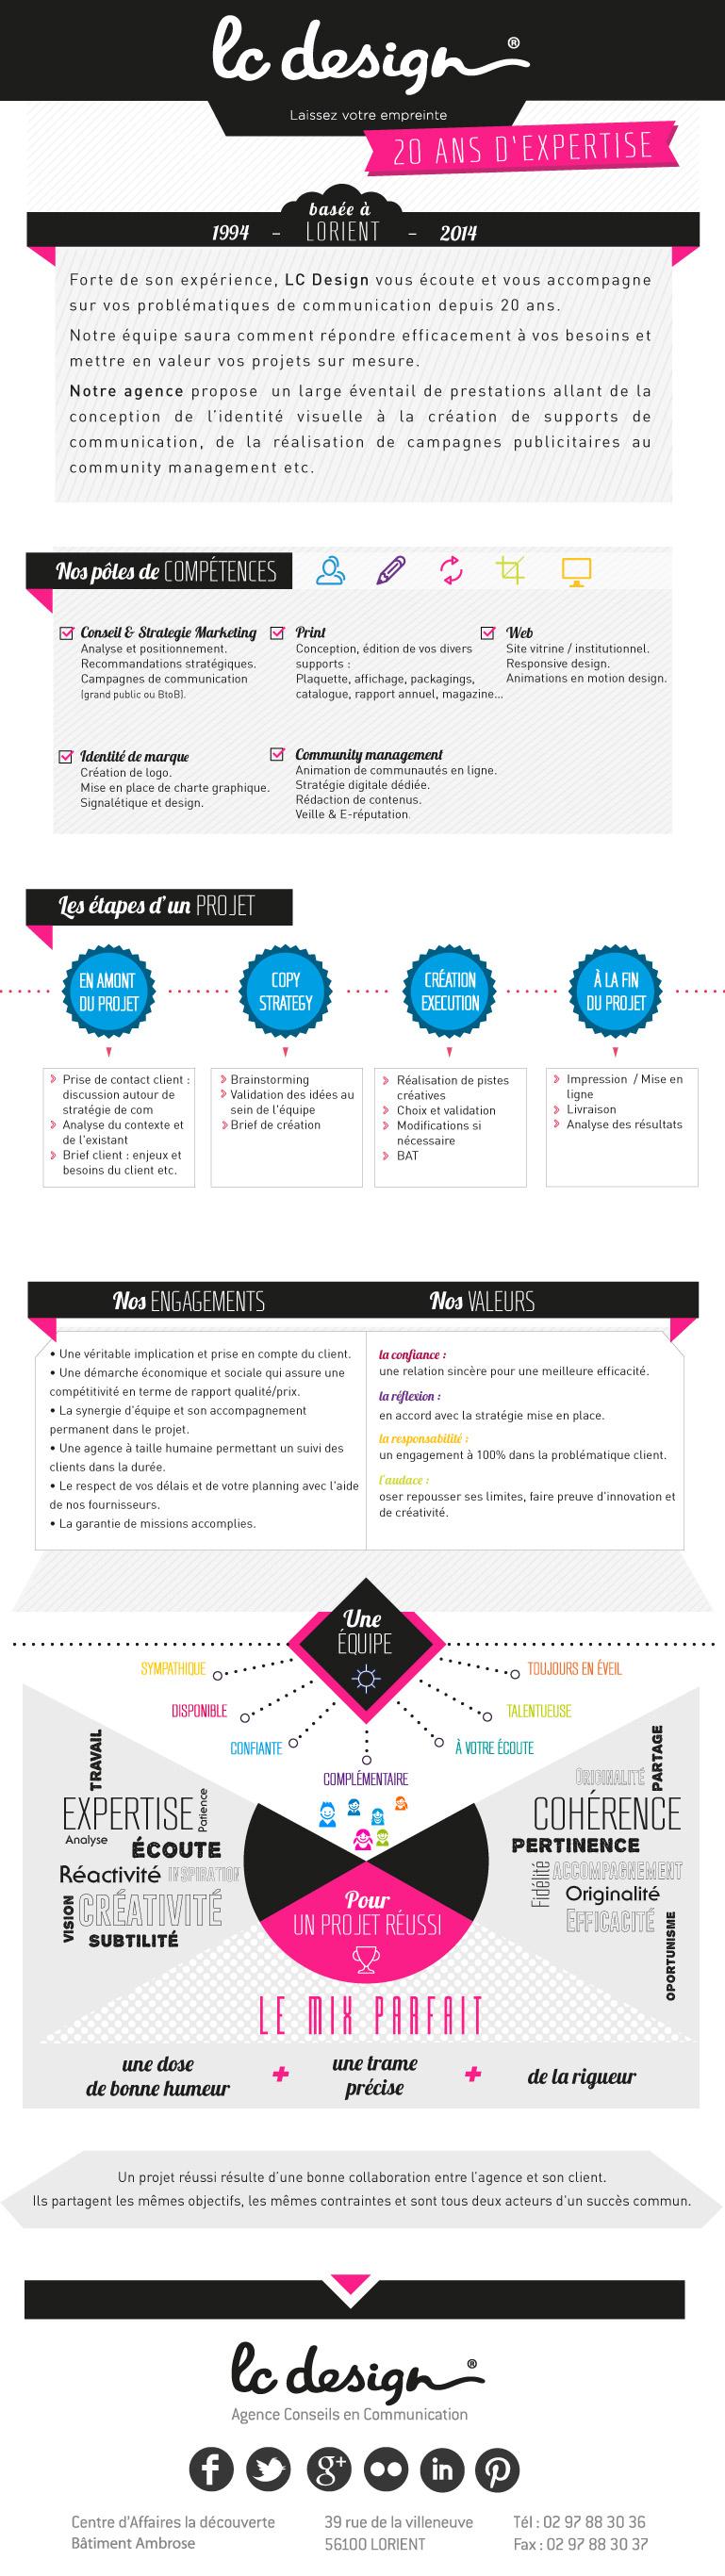 methodologie de l'agence lc design